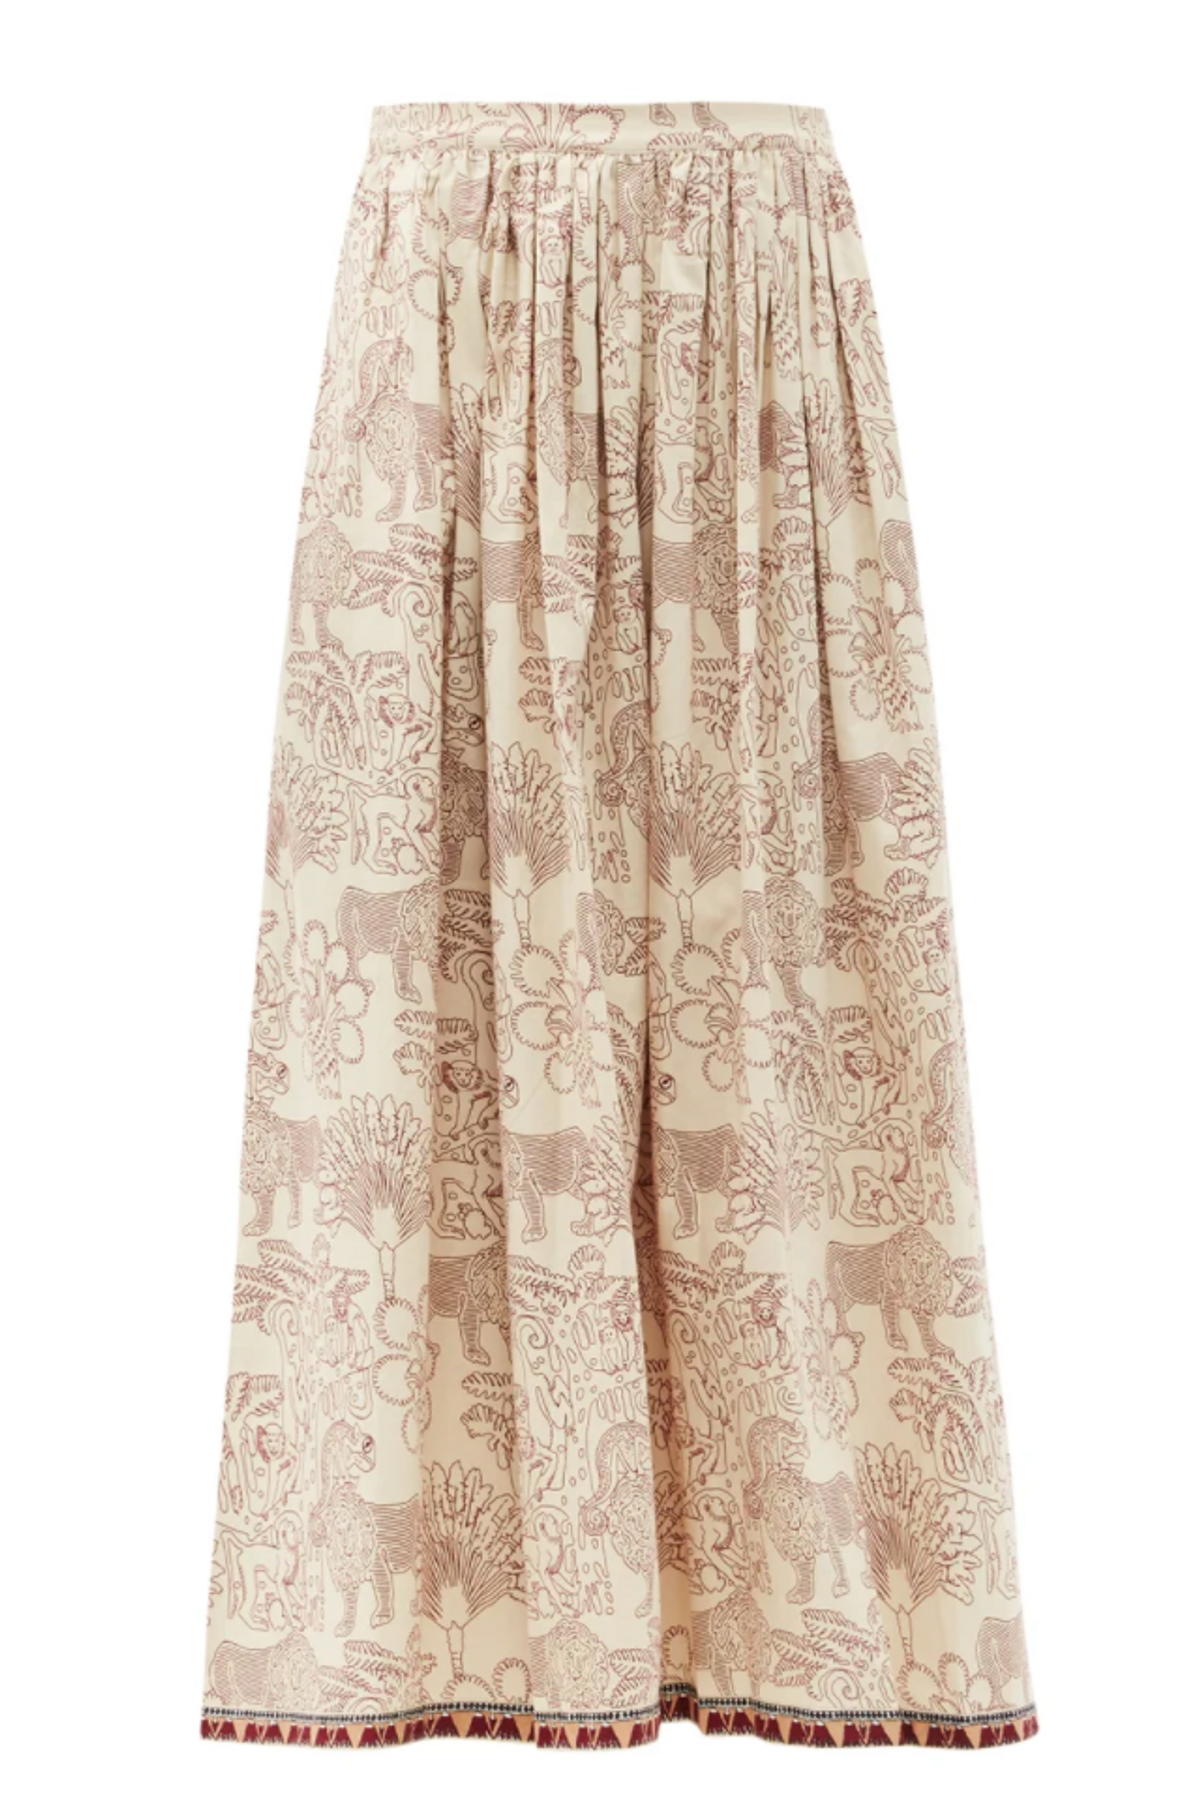 Jane Lion and Monkey Print Cotton Midi Skirt